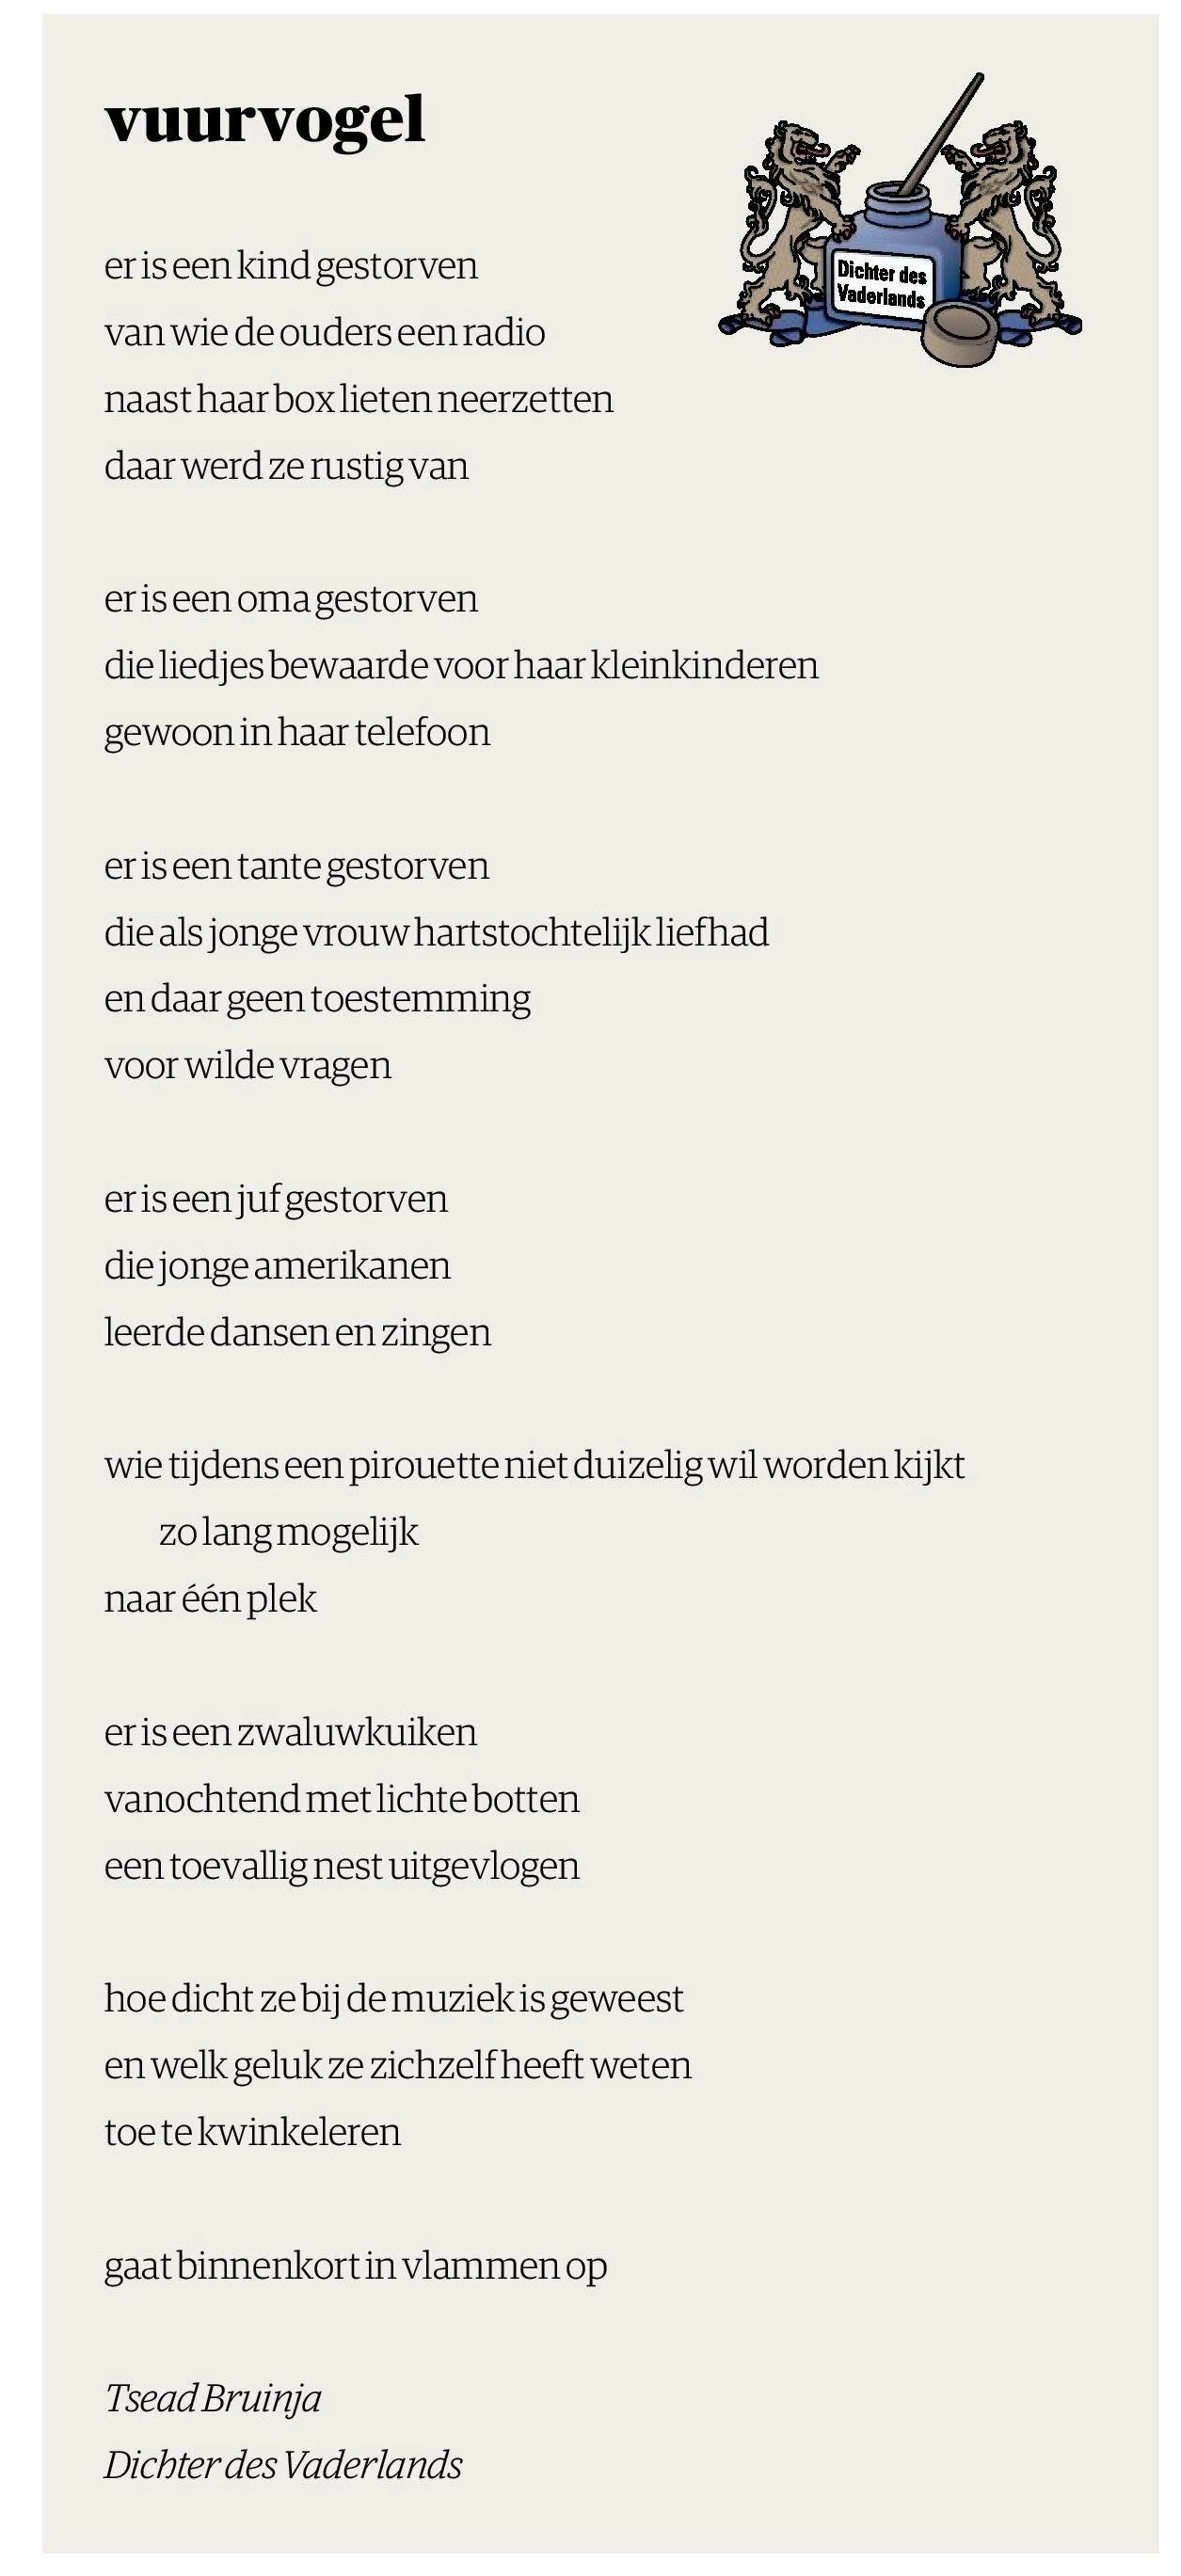 Wonderbaar Vuurvogel - gedicht bij de dood van prinses Christina - Tsead Bruinja LW-63